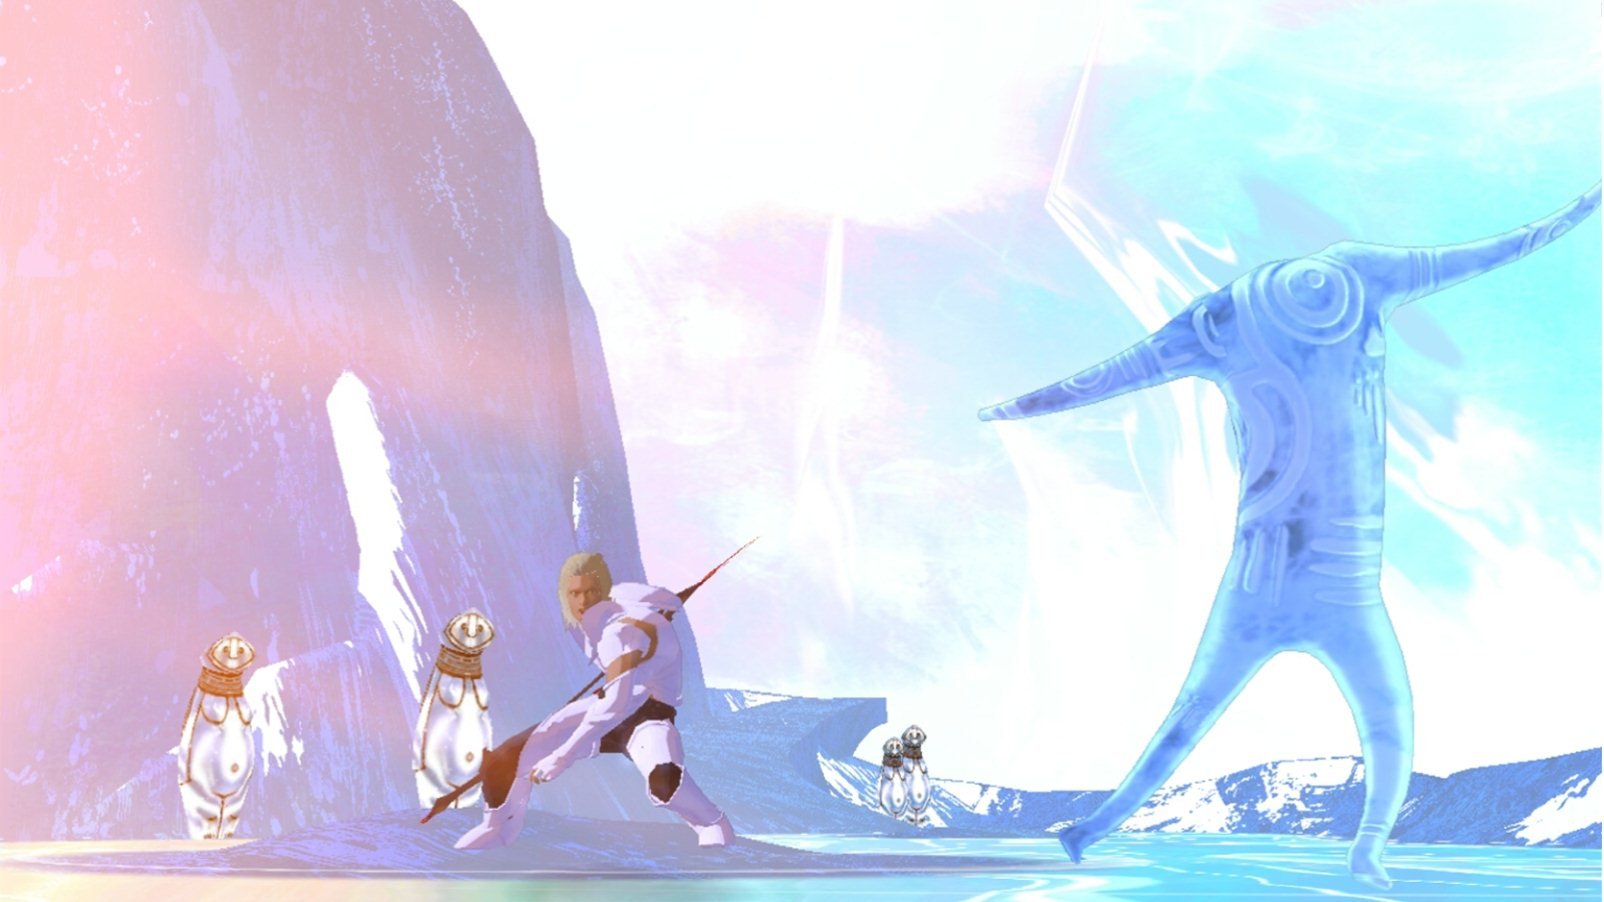 El Shaddai: Ascension of the Metatron - Gameplay